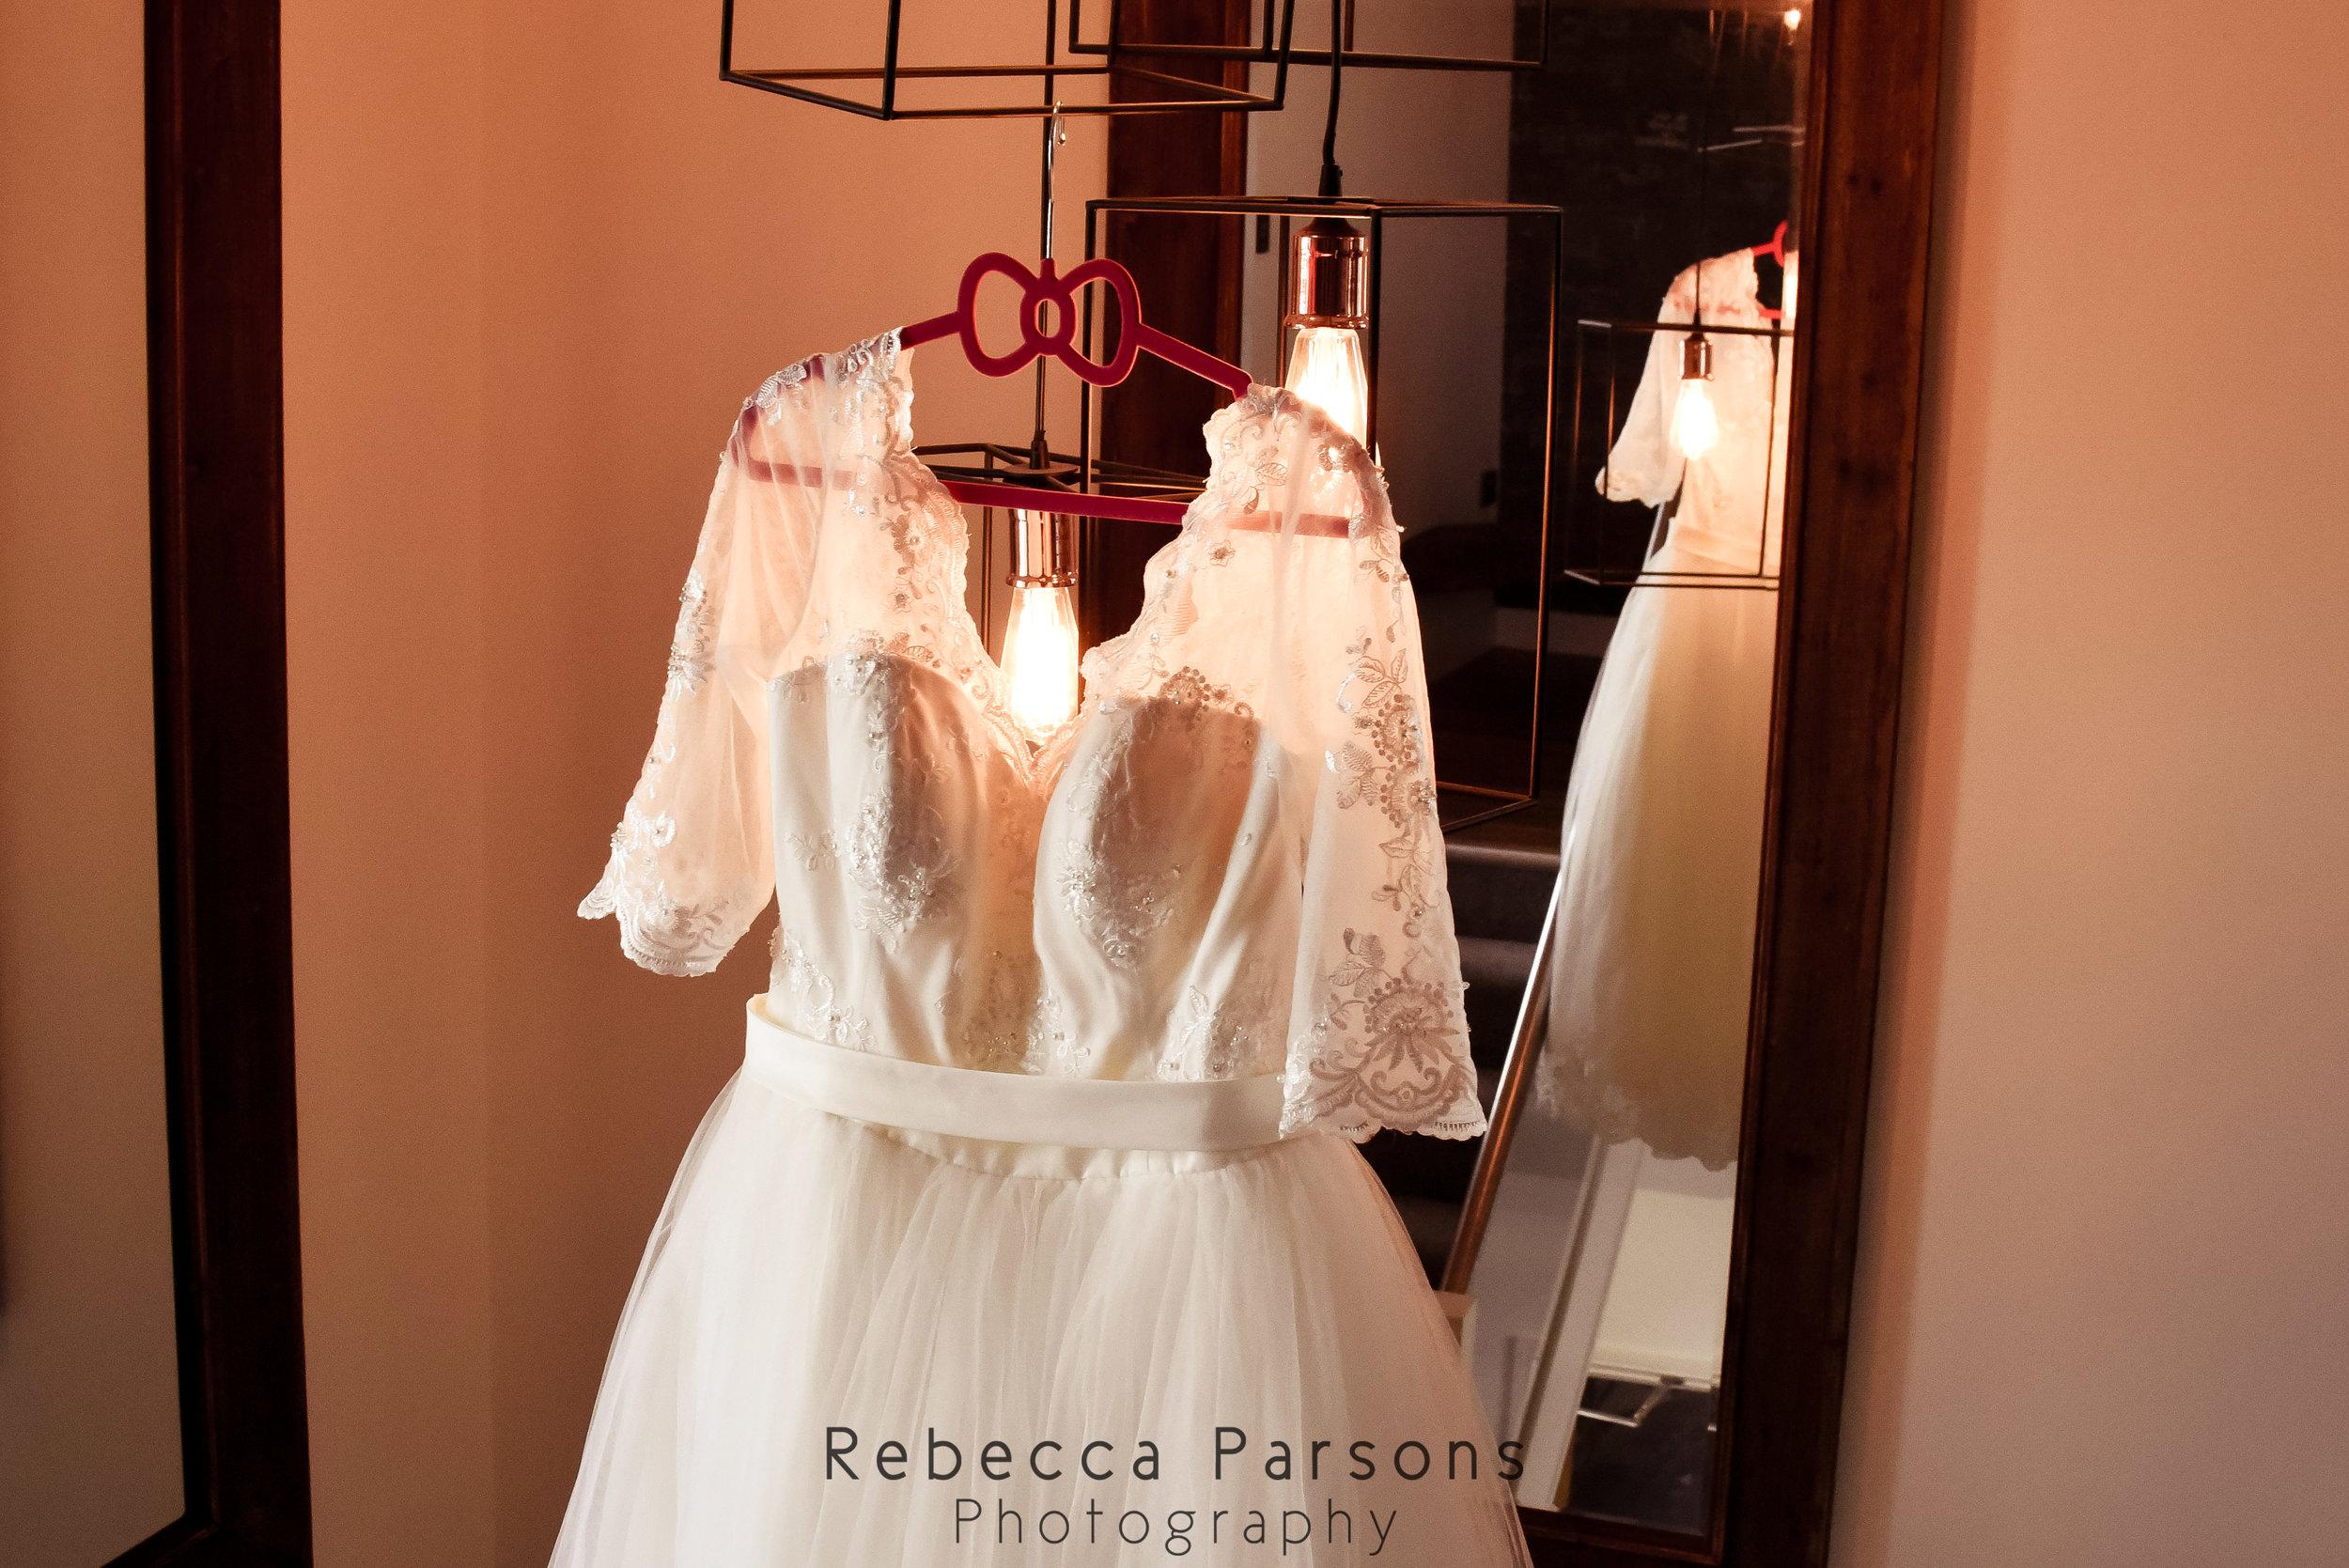 wedding dress hanging from lights